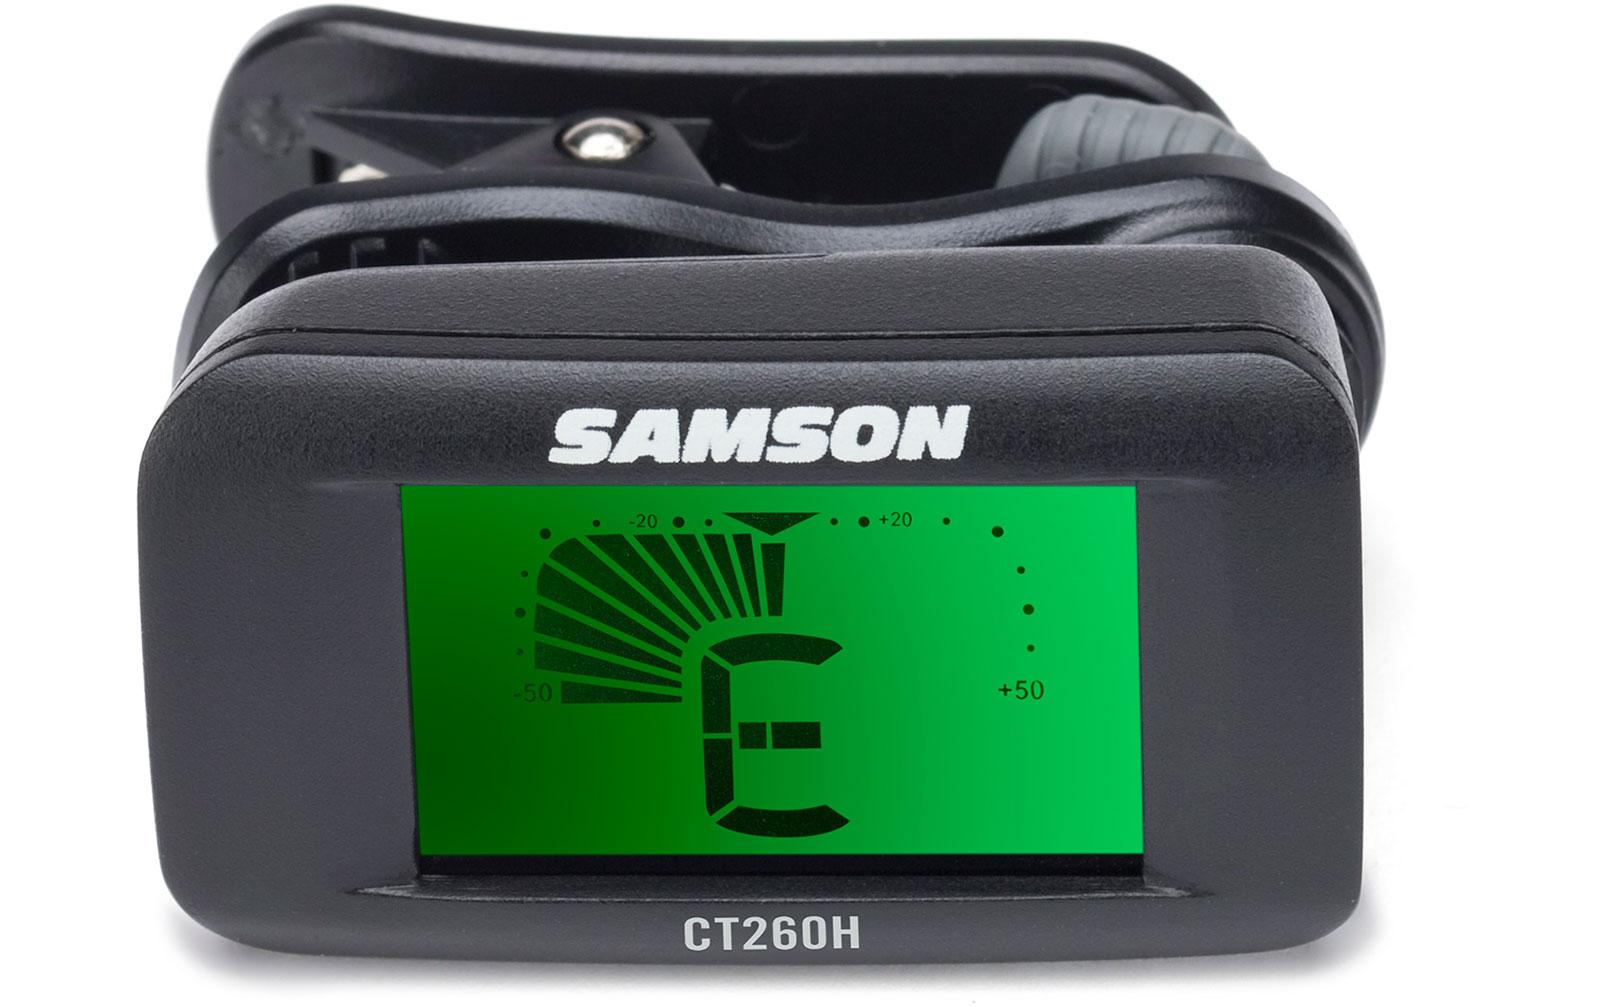 samson-ct260h-clip-on-chromatic-tuner